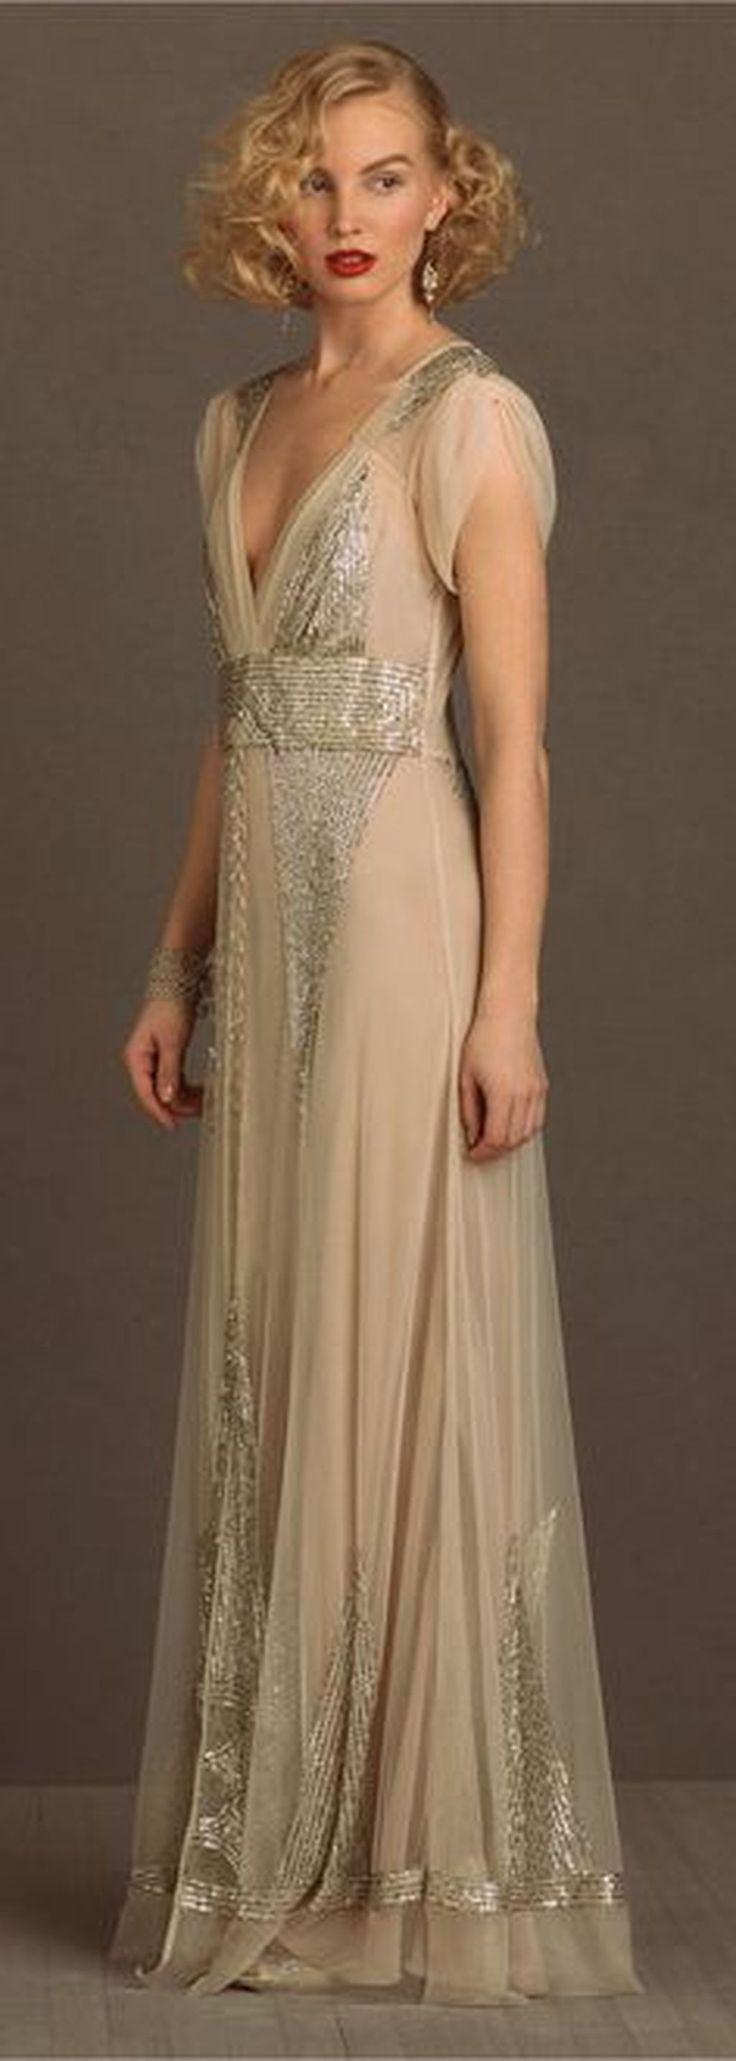 25+ best ideas about Sequin wedding dresses on Pinterest ...